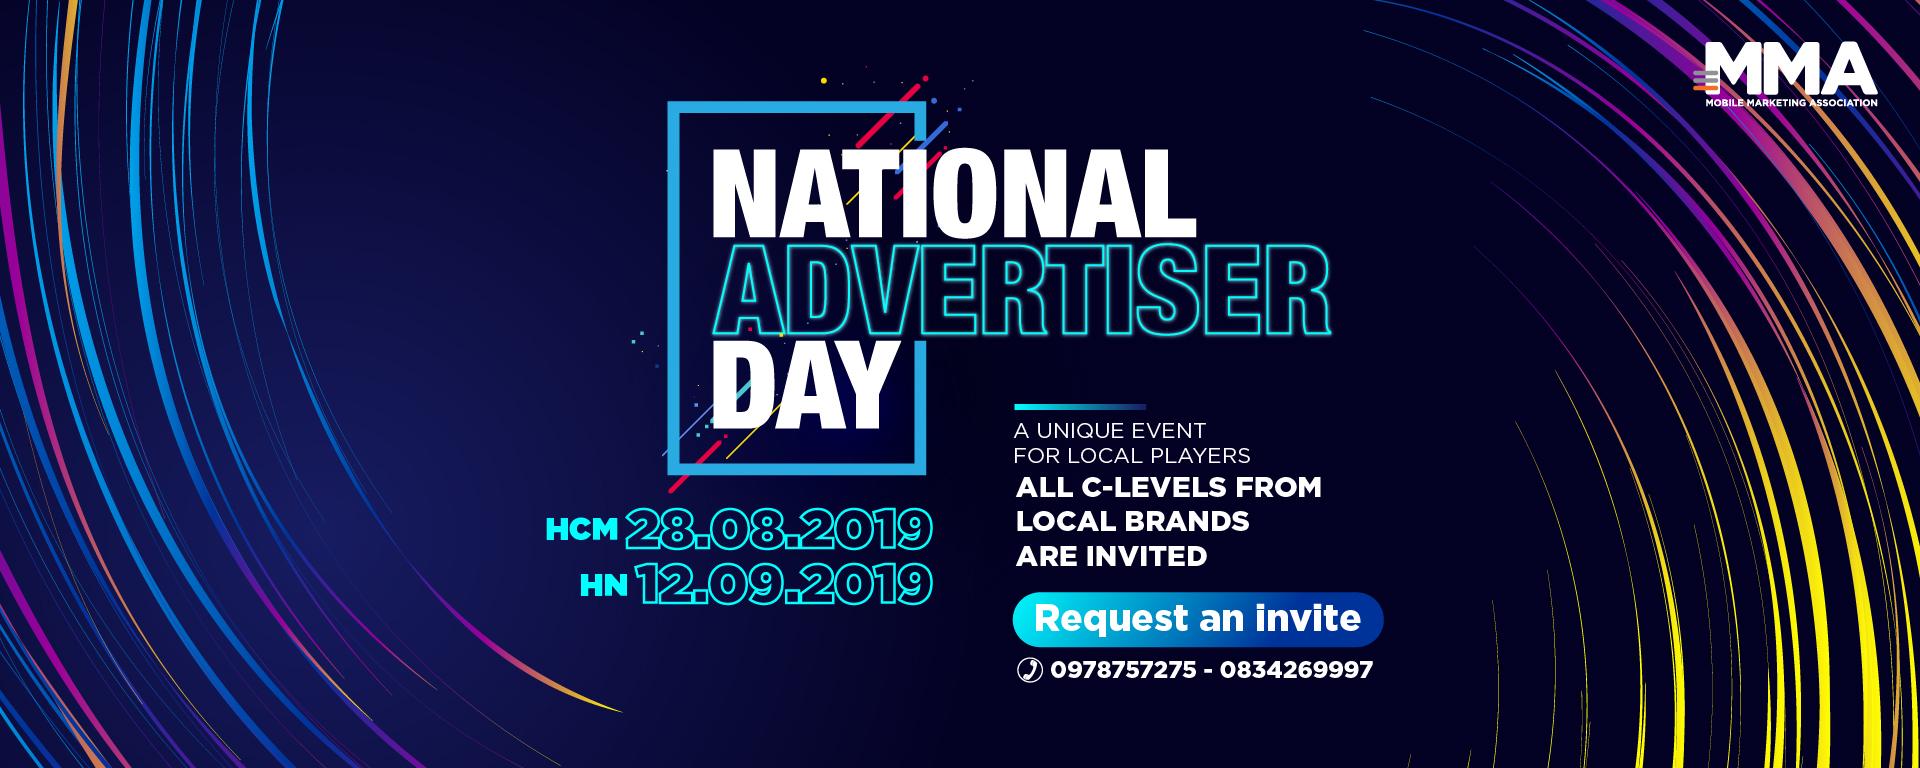 NATIONAL-ADVERTISER-DAY-BANNER